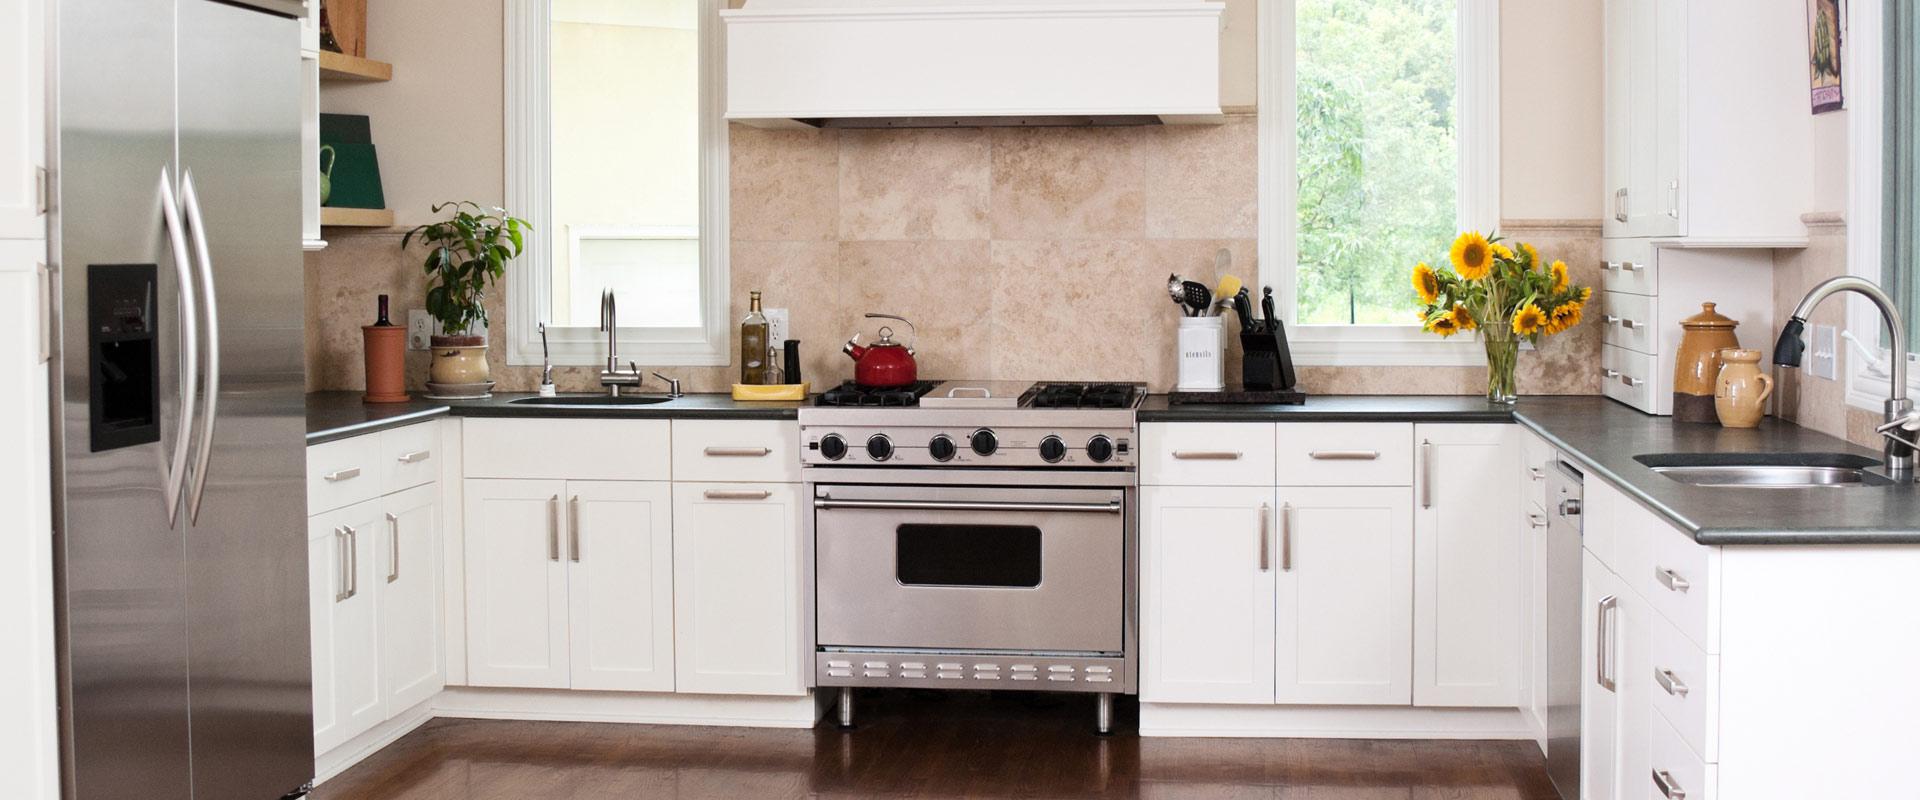 Little Rock Appliance Repair, Dishwasher, Refrigerator